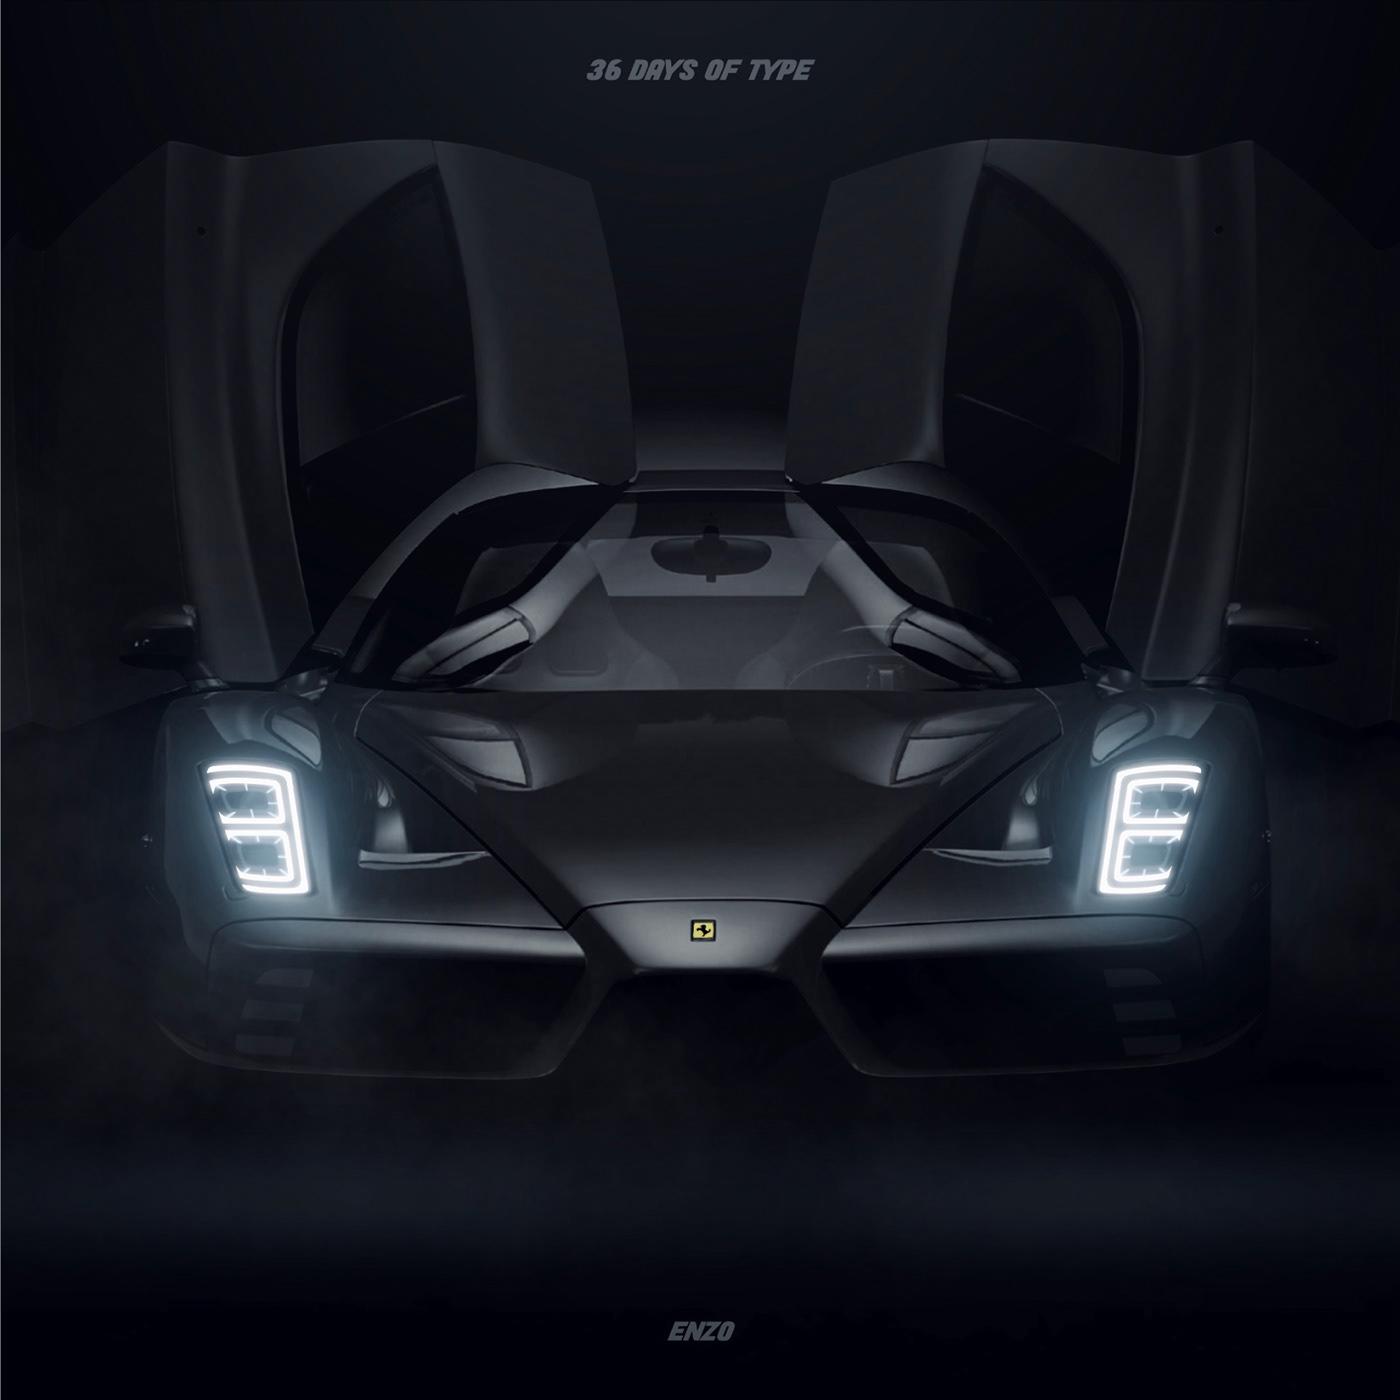 36daysoftype Audi car Cars graphicdesign graphics headlights lamborghini Supercars typography